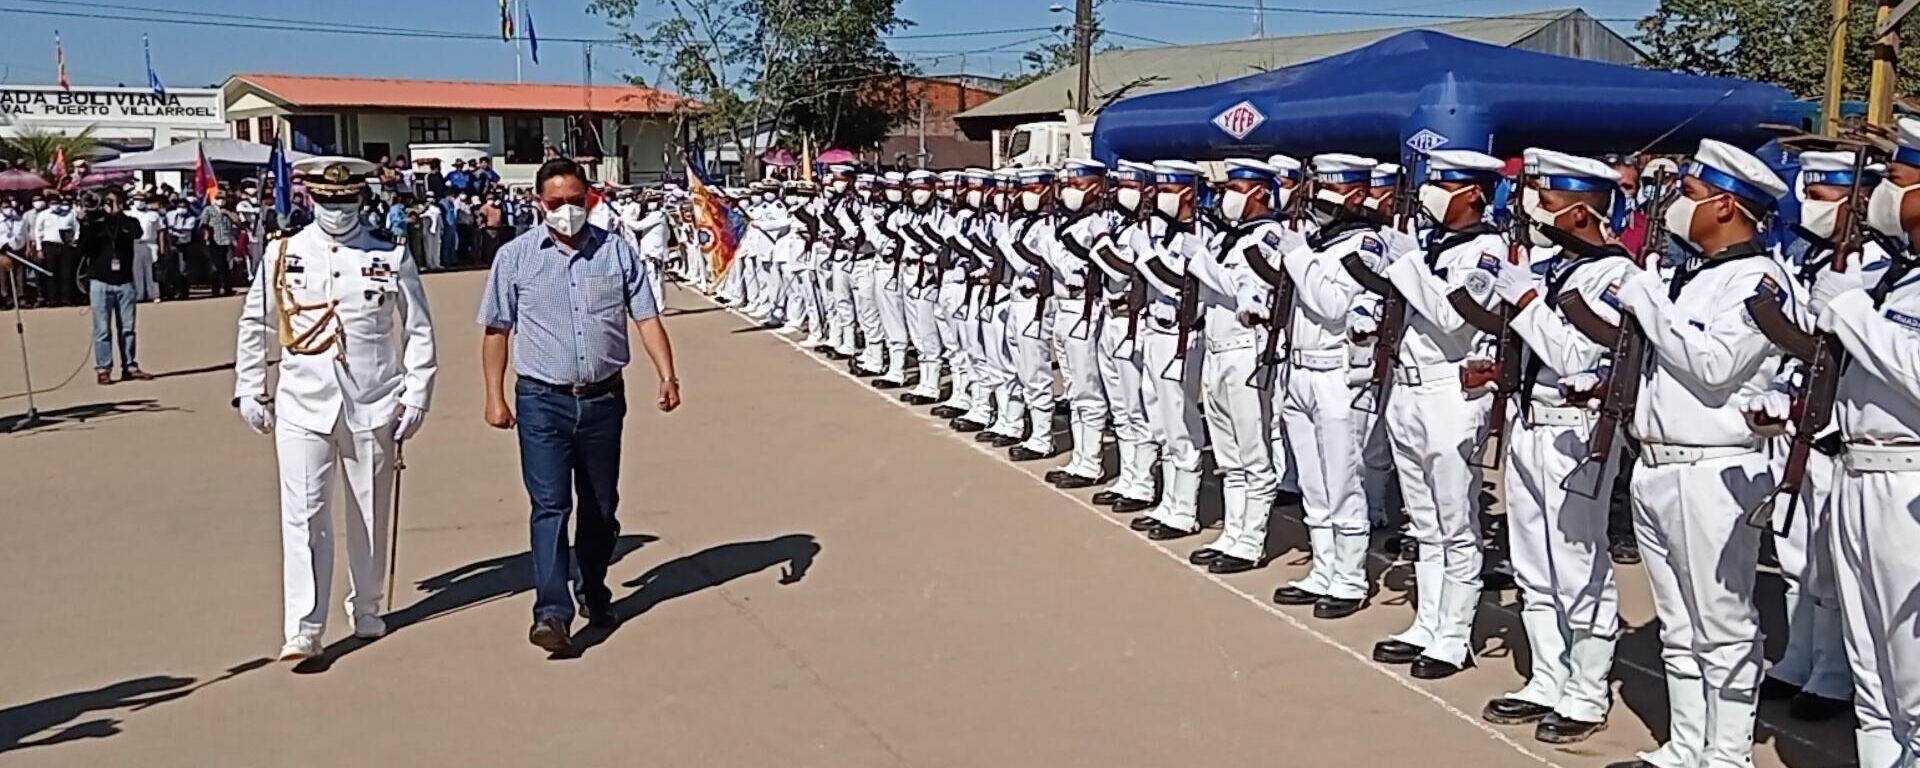 El presidente de Bolivia, Luis Arce reinauguró la hidrovía Ichilo-Mamoré en Puerto Villarroel - Sputnik Mundo, 1920, 05.07.2021